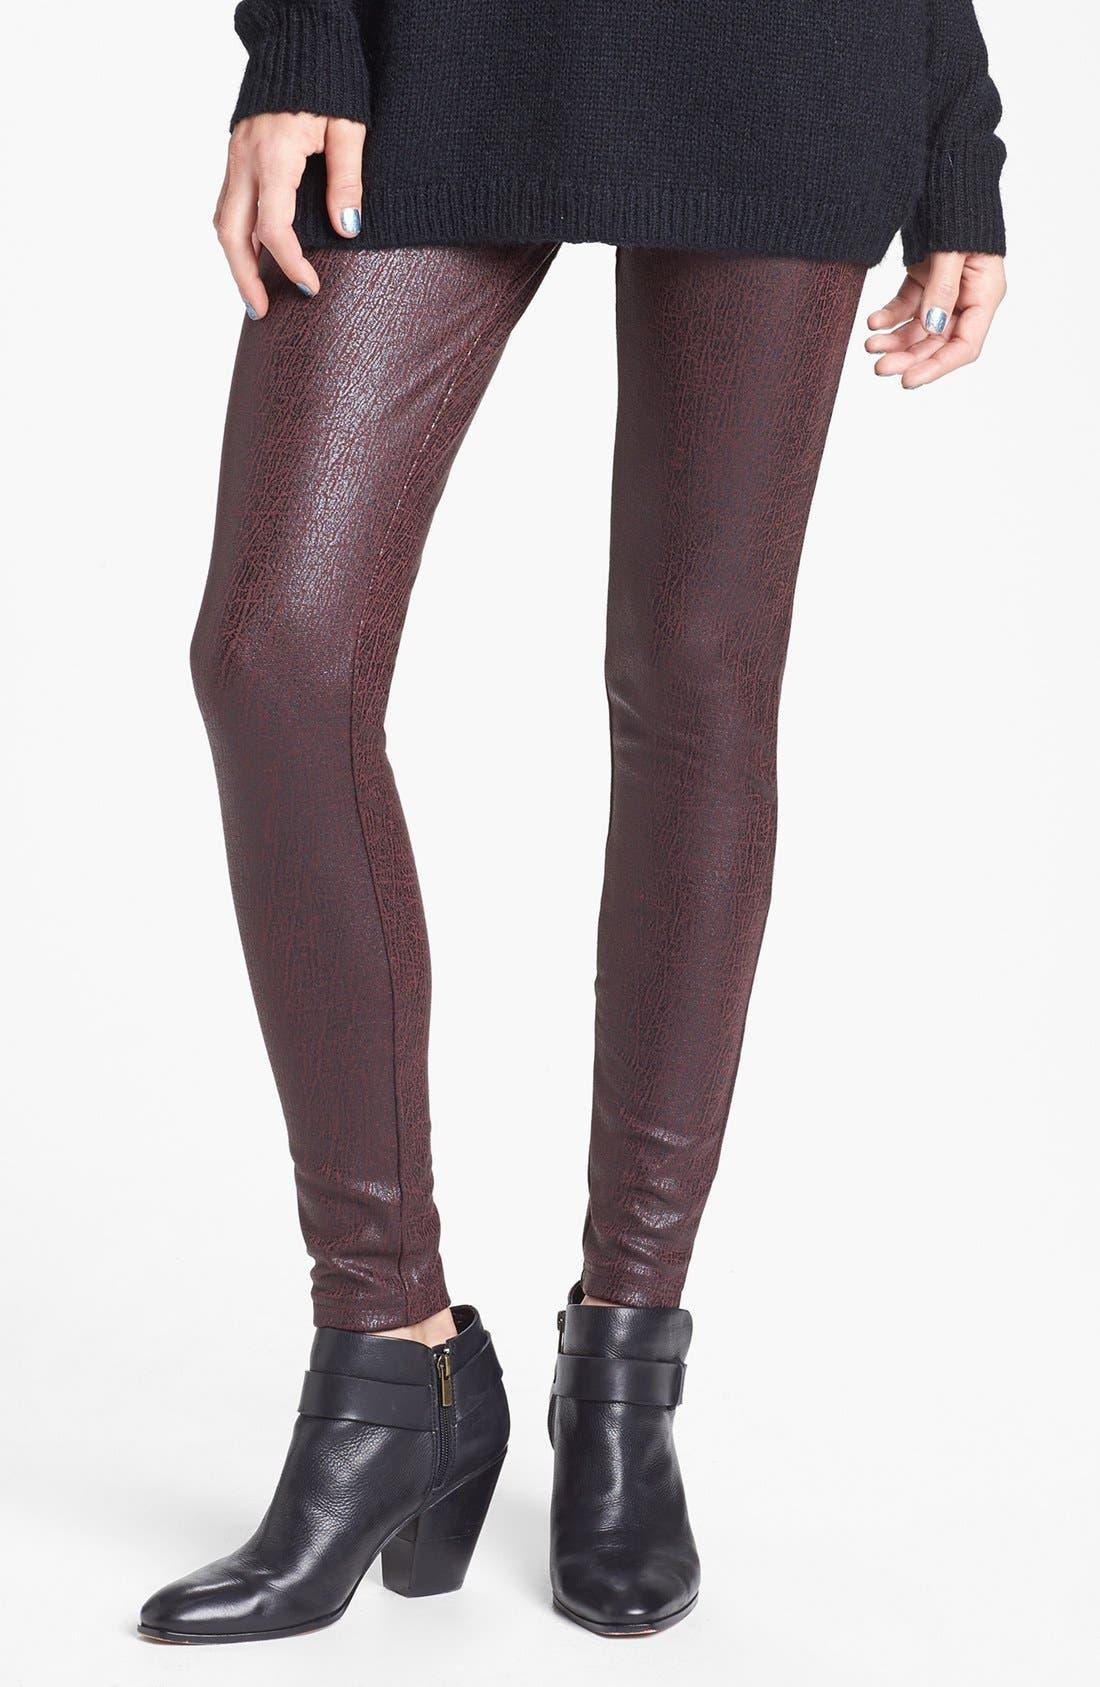 BP., Crackled Faux Leather Leggings, Main thumbnail 1, color, 600